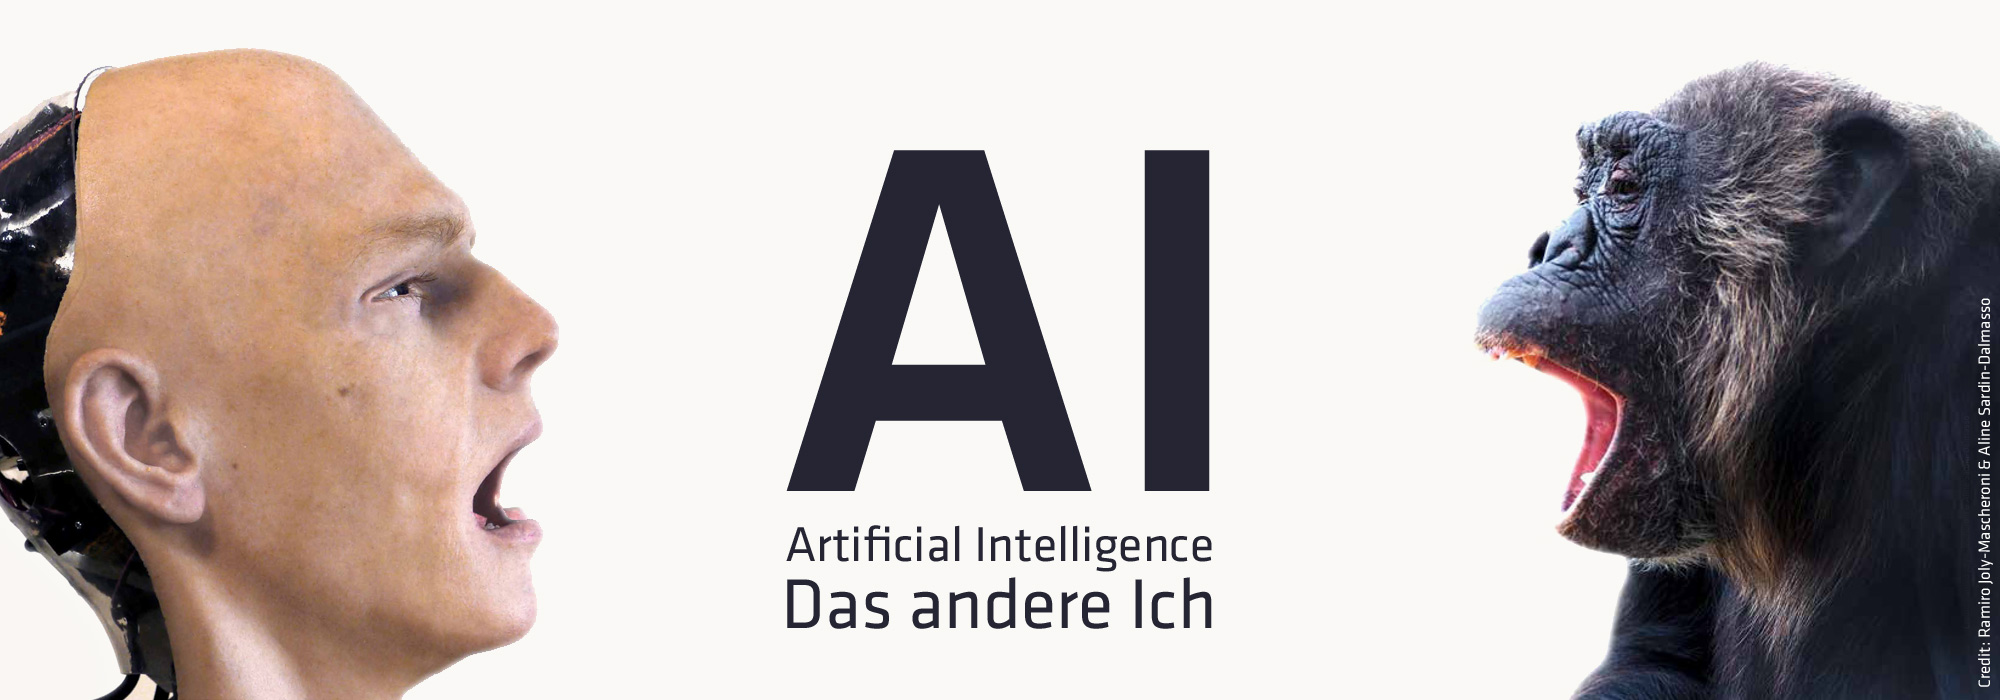 sujet-ars2017-1